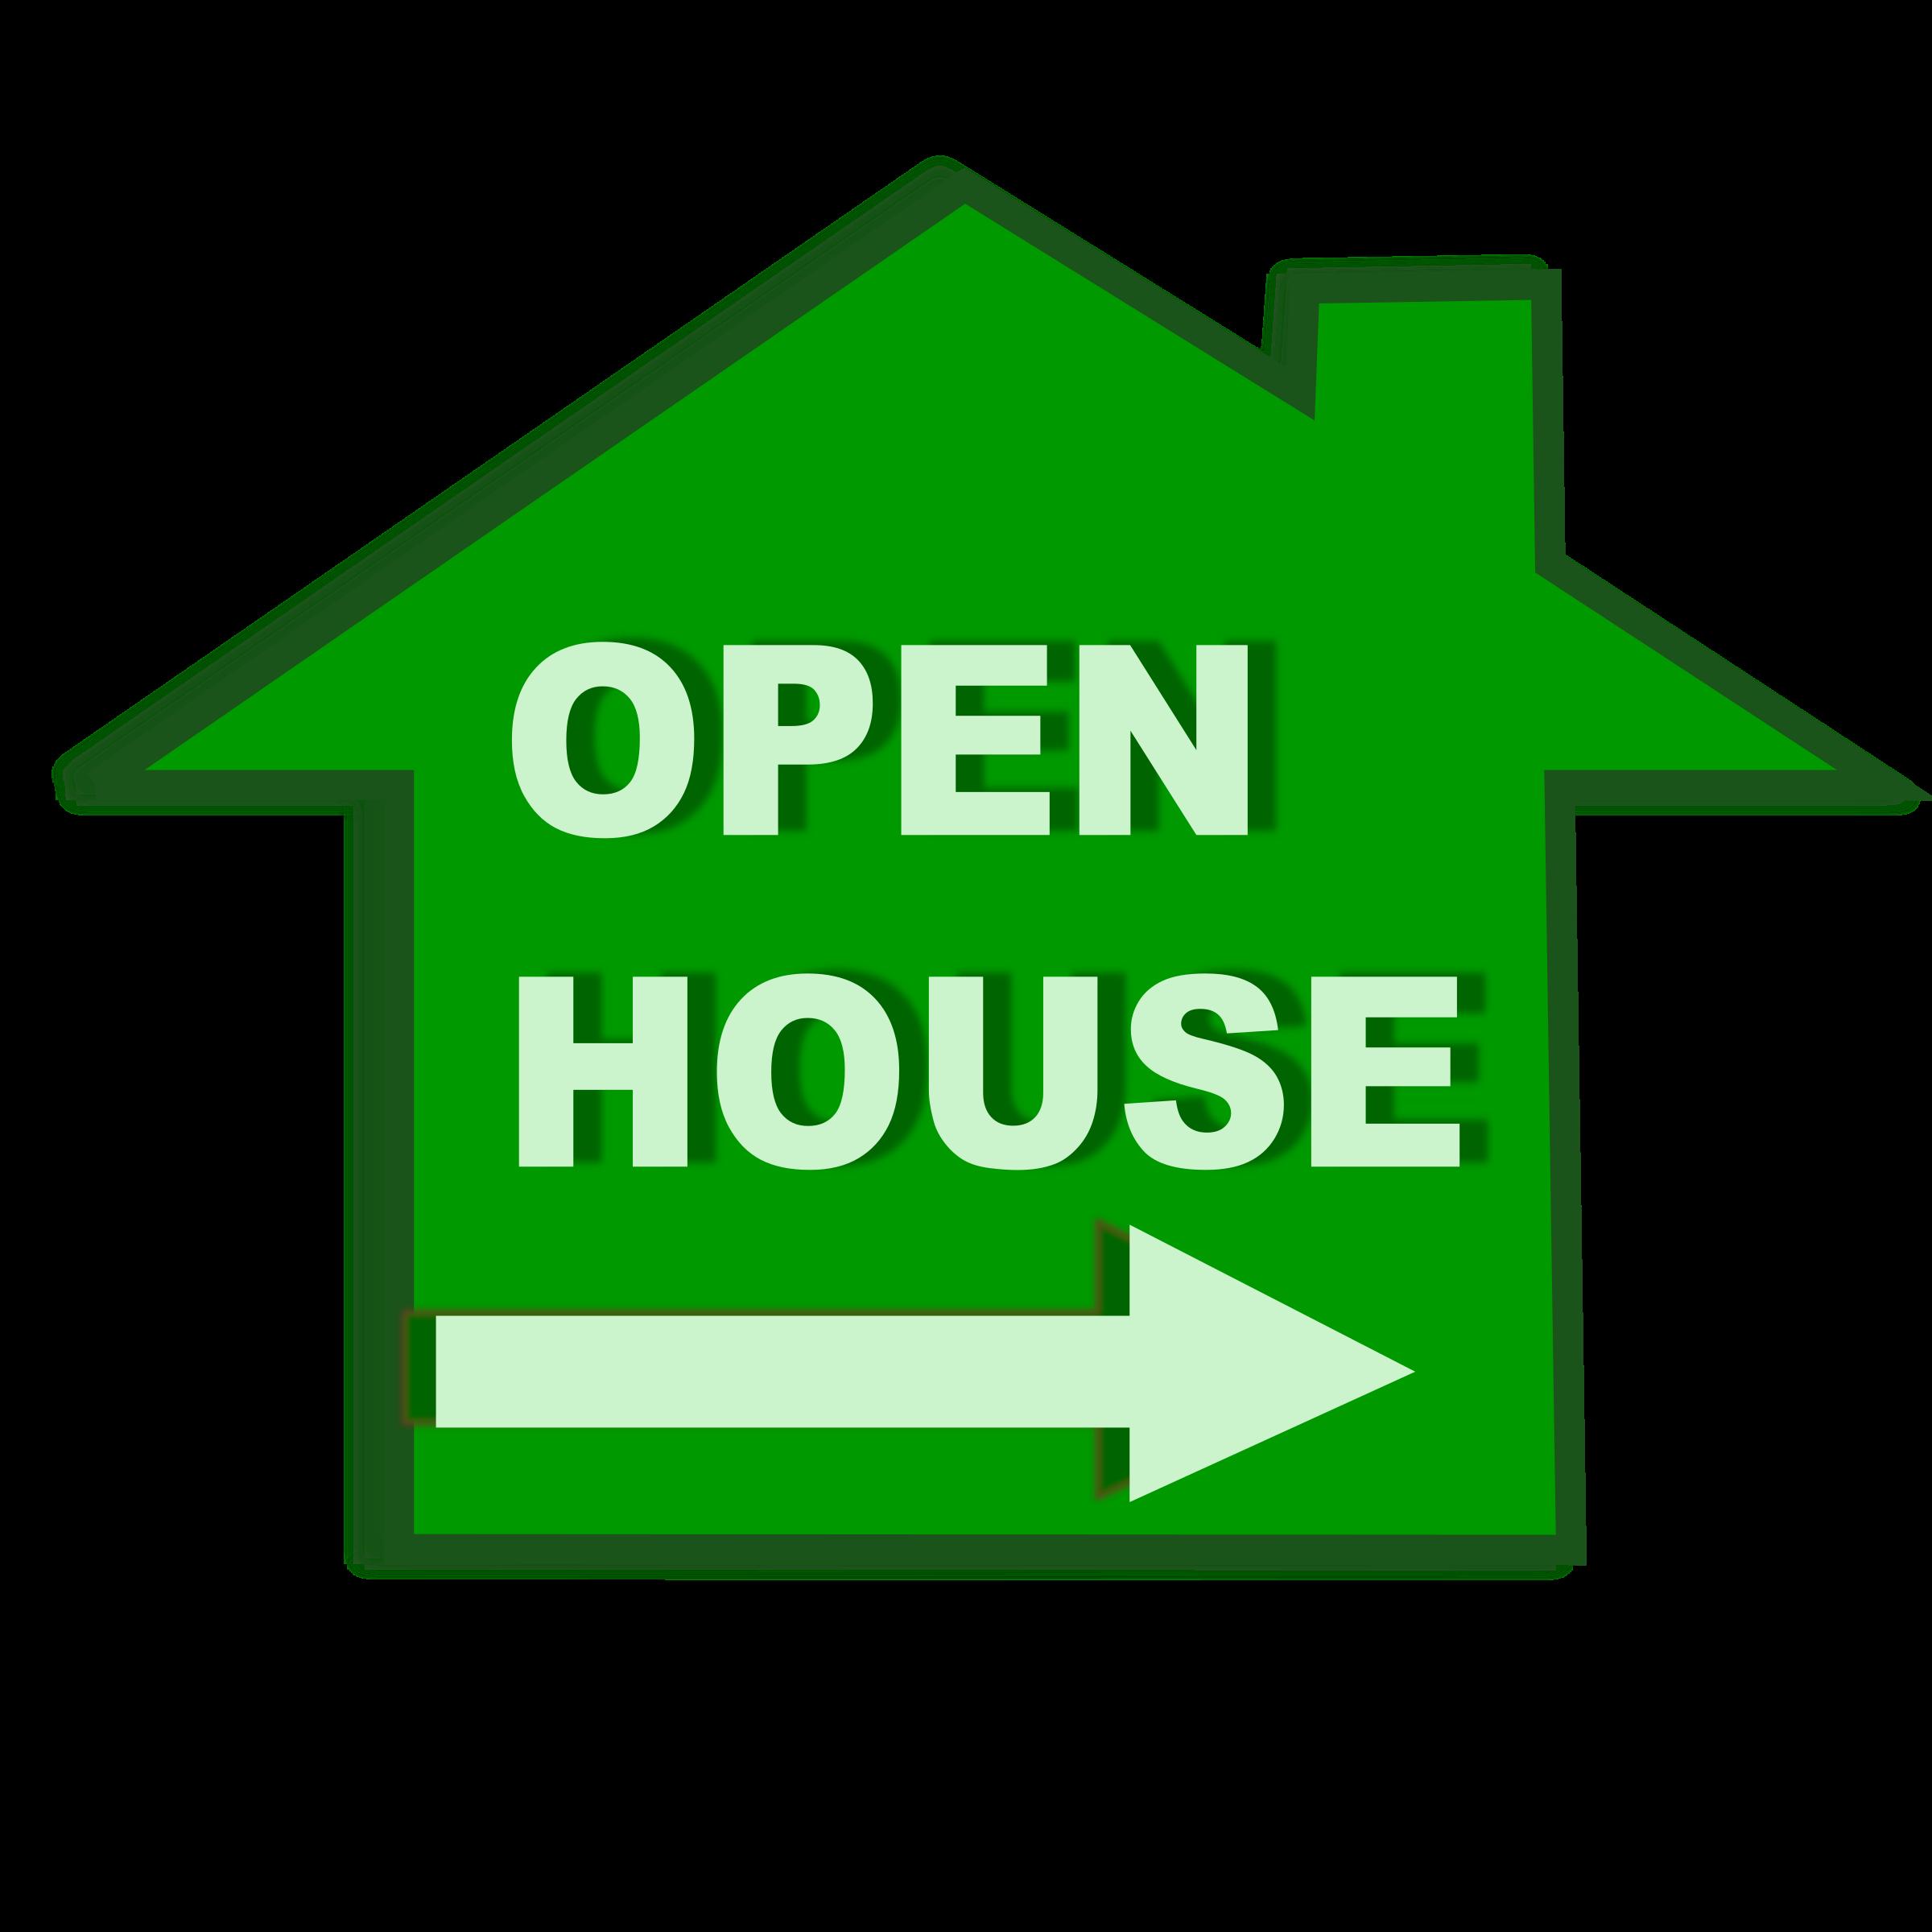 Open house big image. Boulder clipart icon